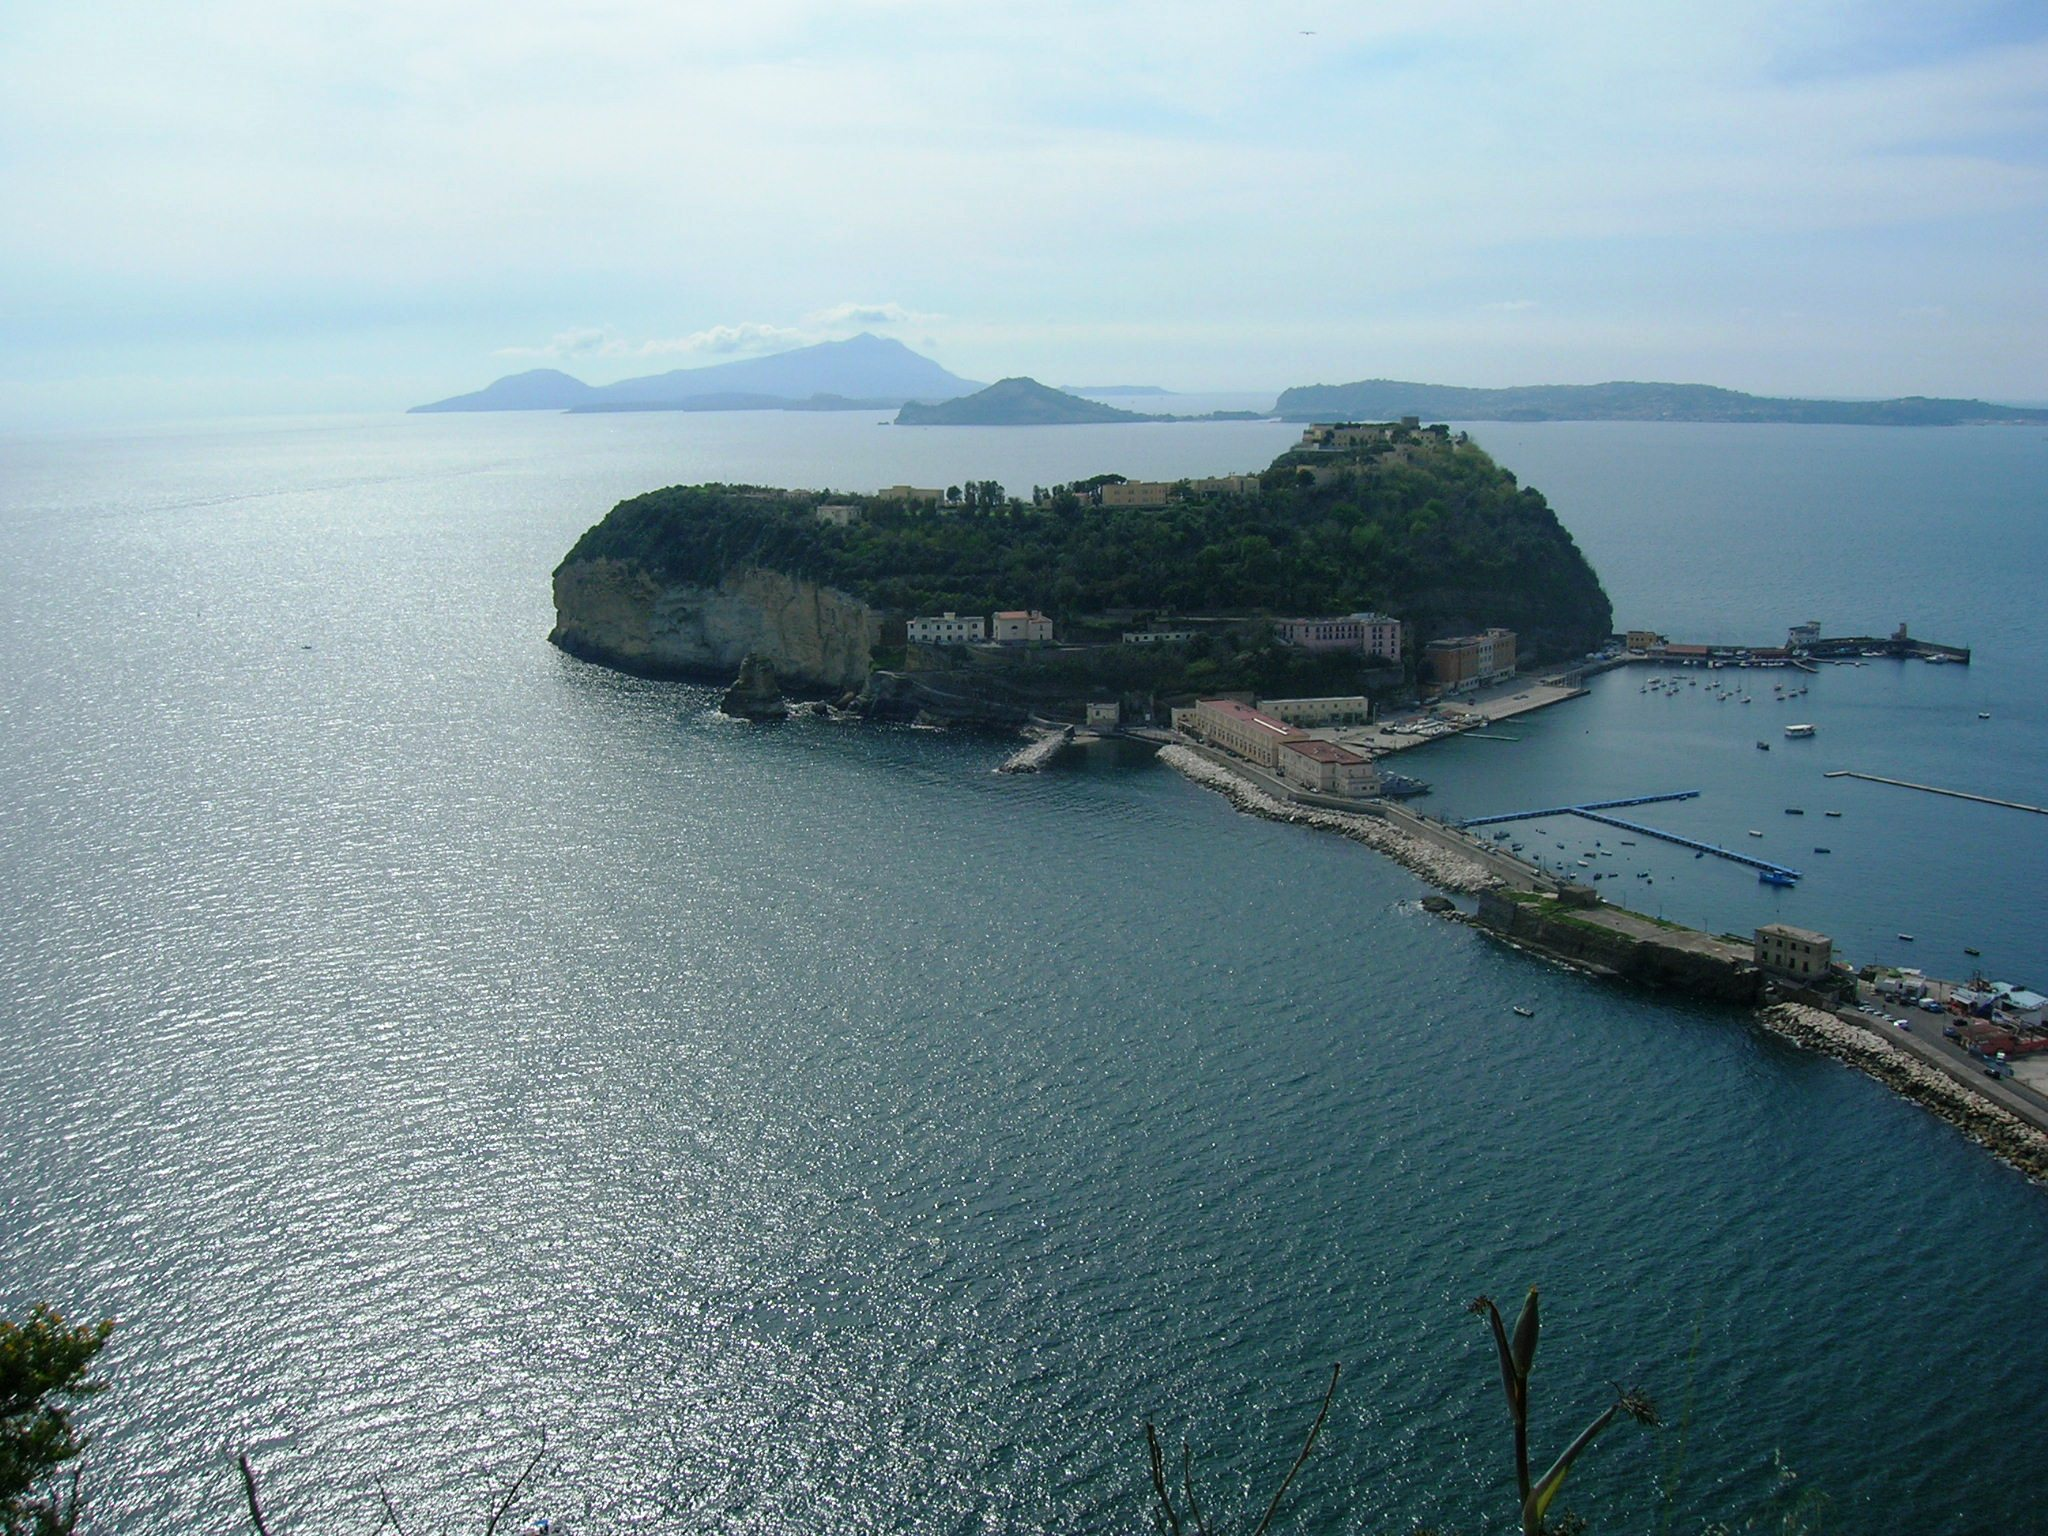 Napoli, Isola di Nisida - Foto di Mentnafunangann